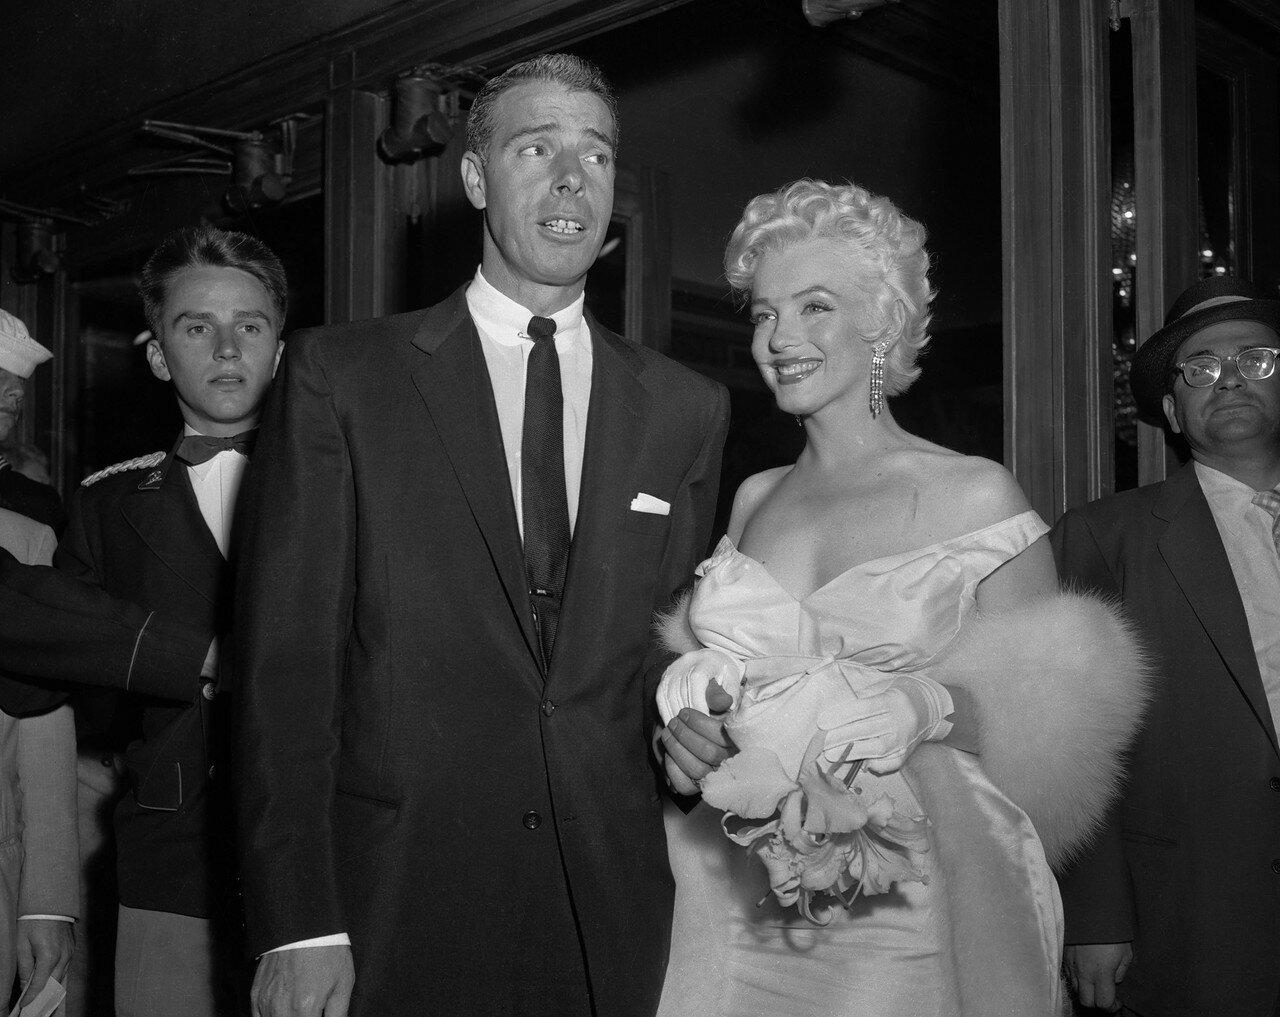 A Look Back At Marilyn Monroe And Joe DiMaggios Wedding